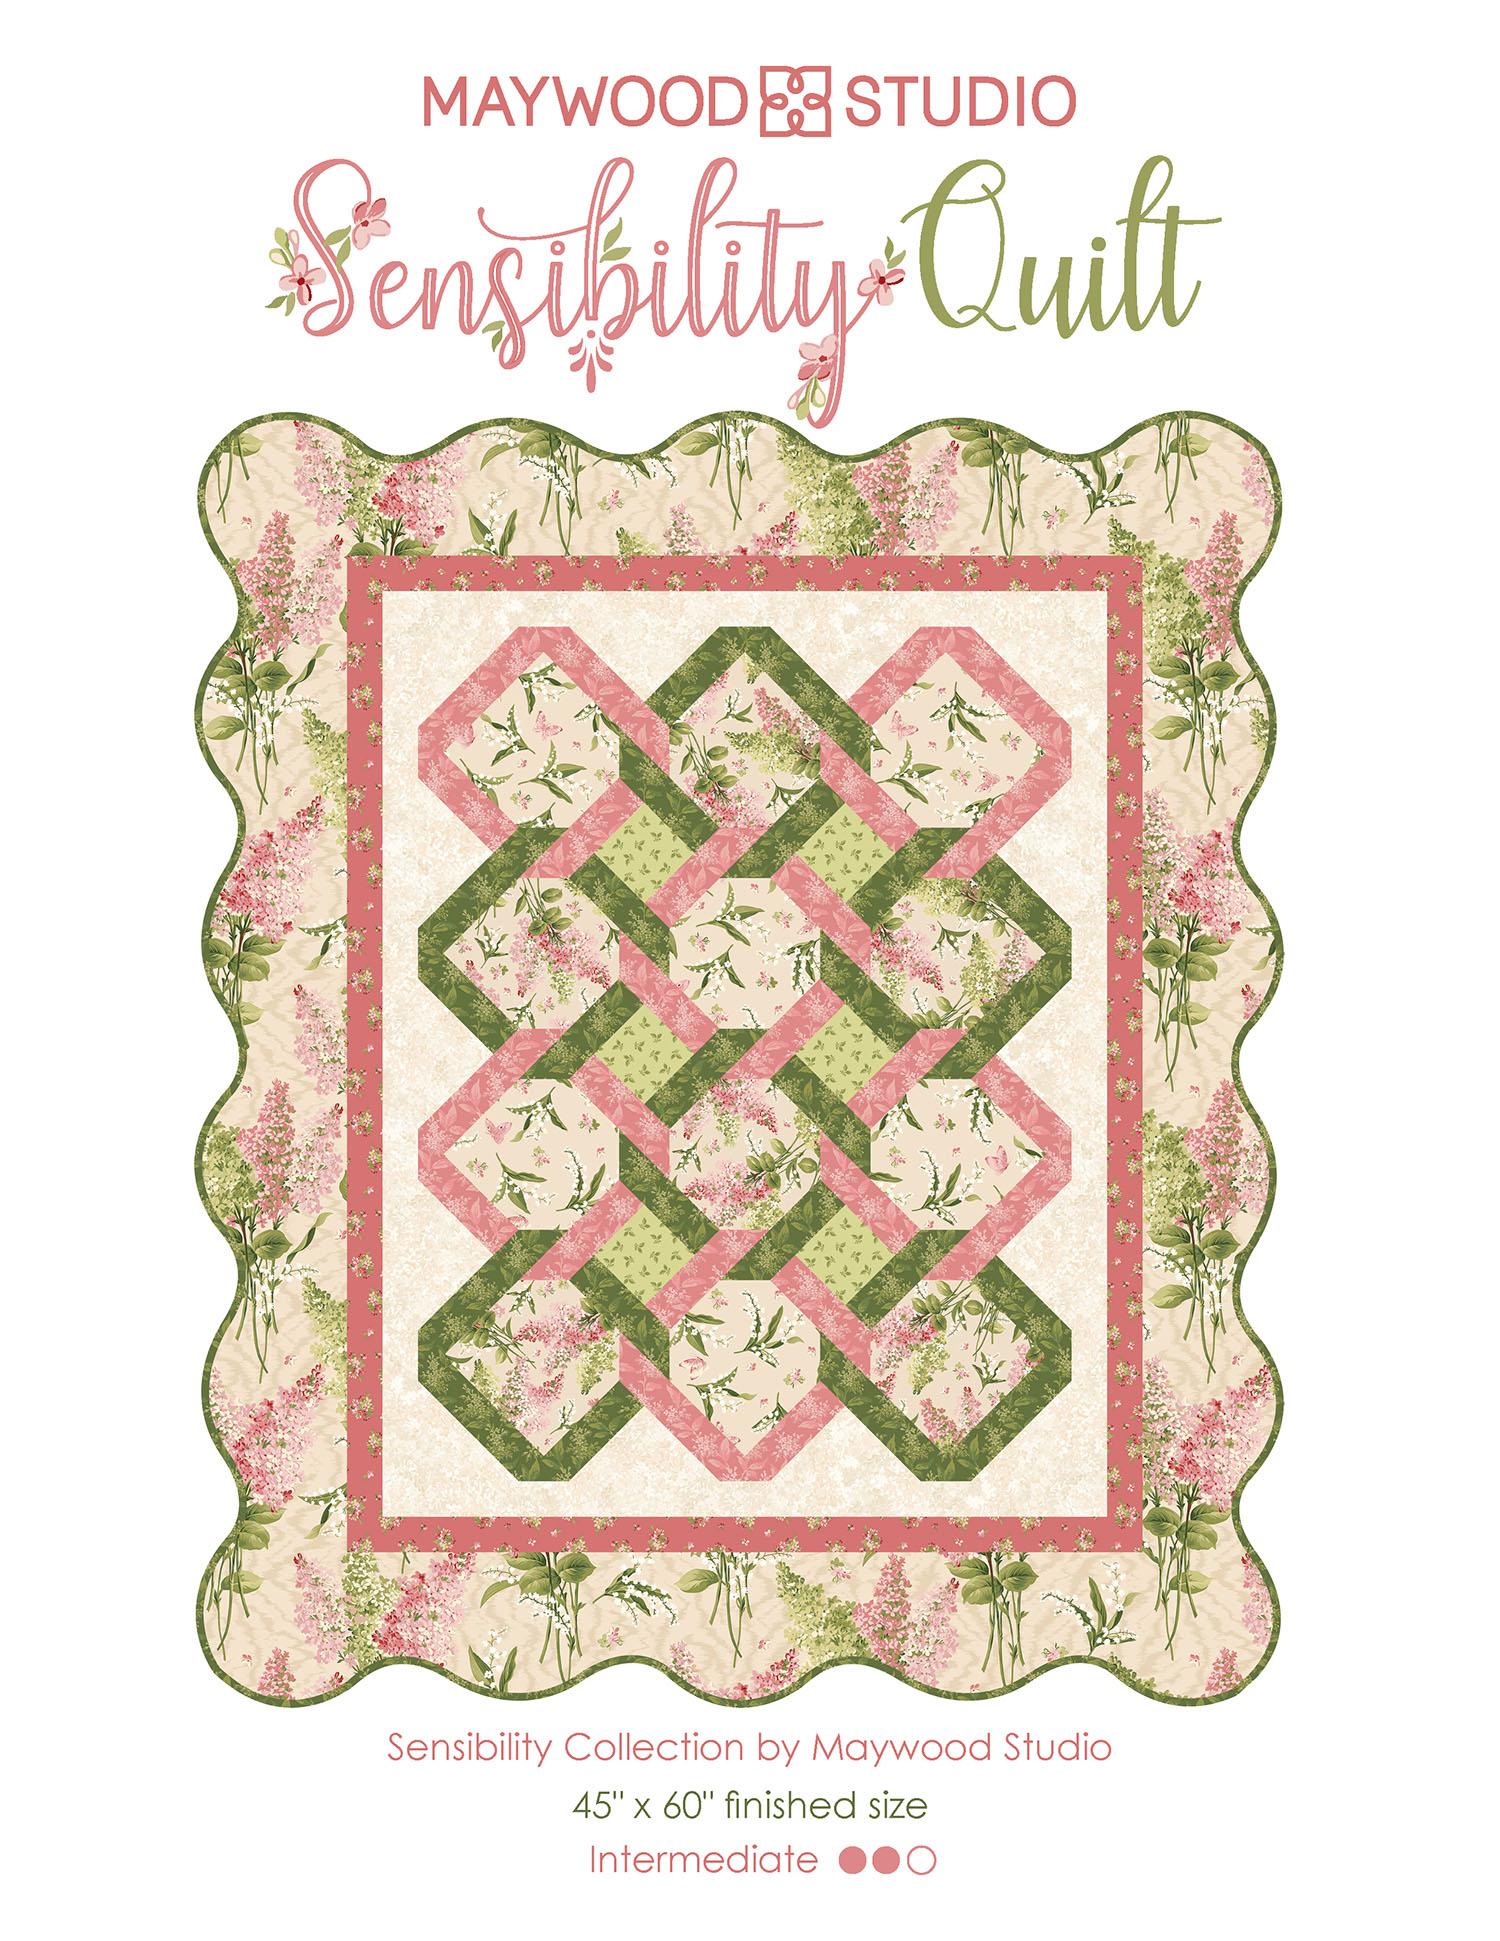 Sensibility Quilt